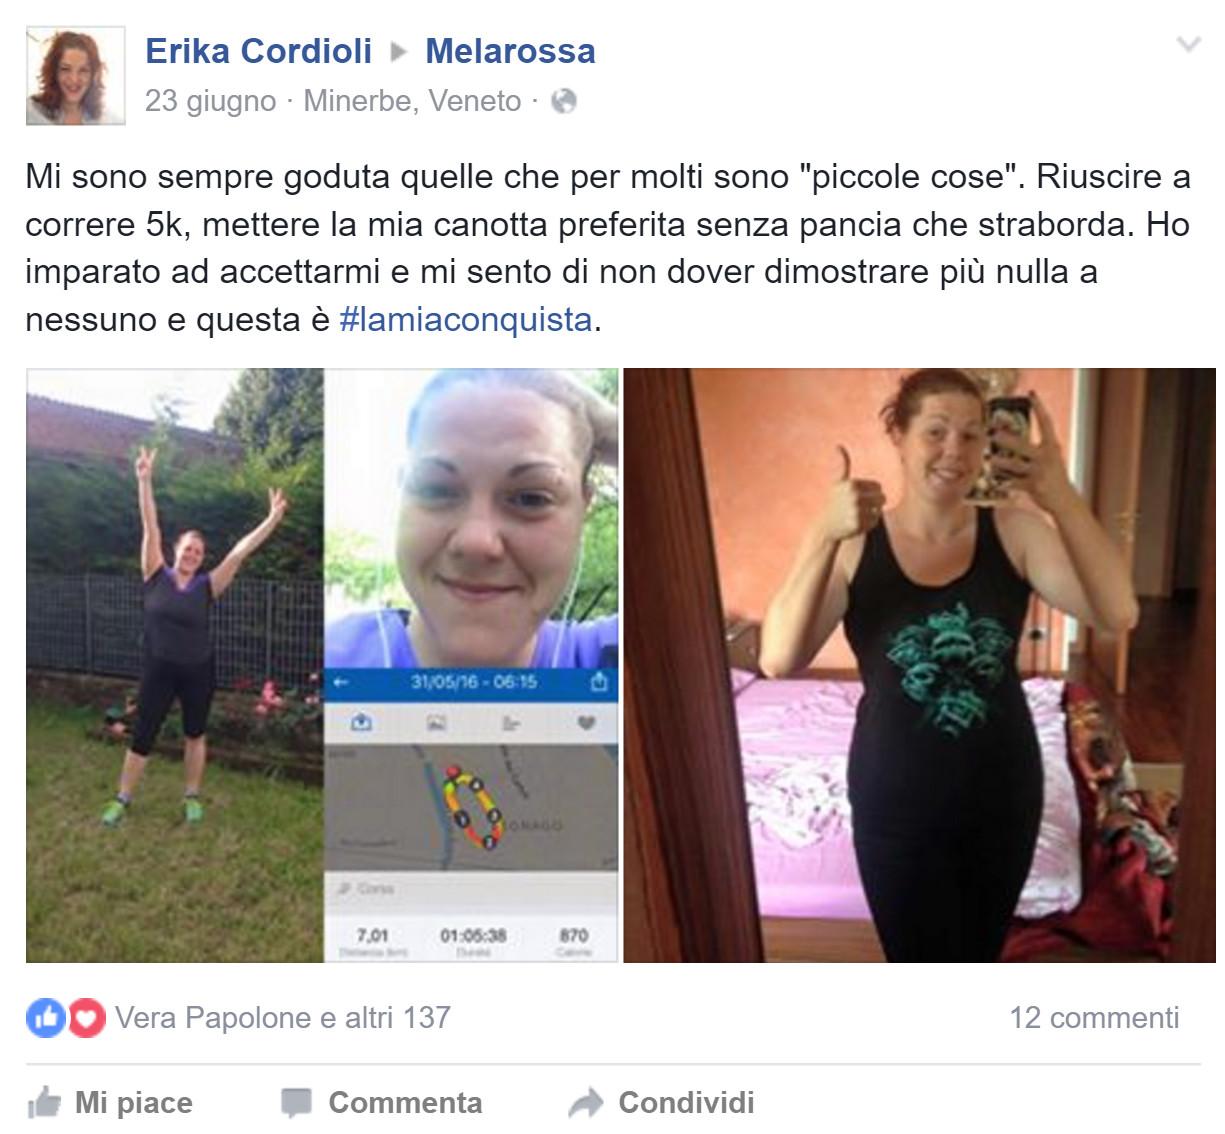 Erika è dimagrita con Melarossa